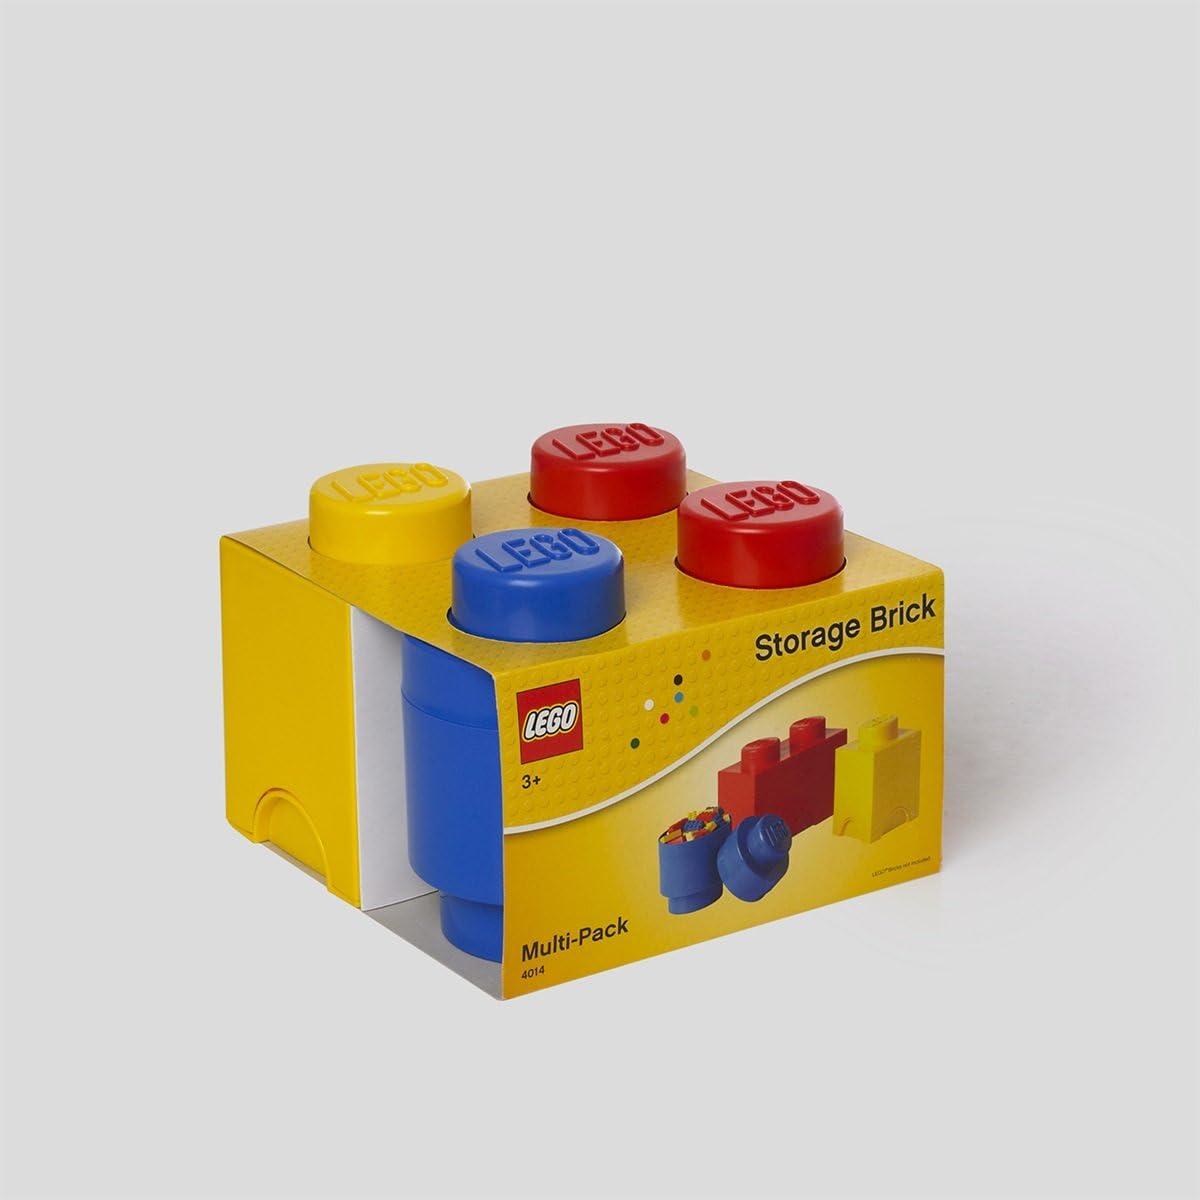 4-Piece Room Copenhagen Lego Storage Brick Multipack Neutral